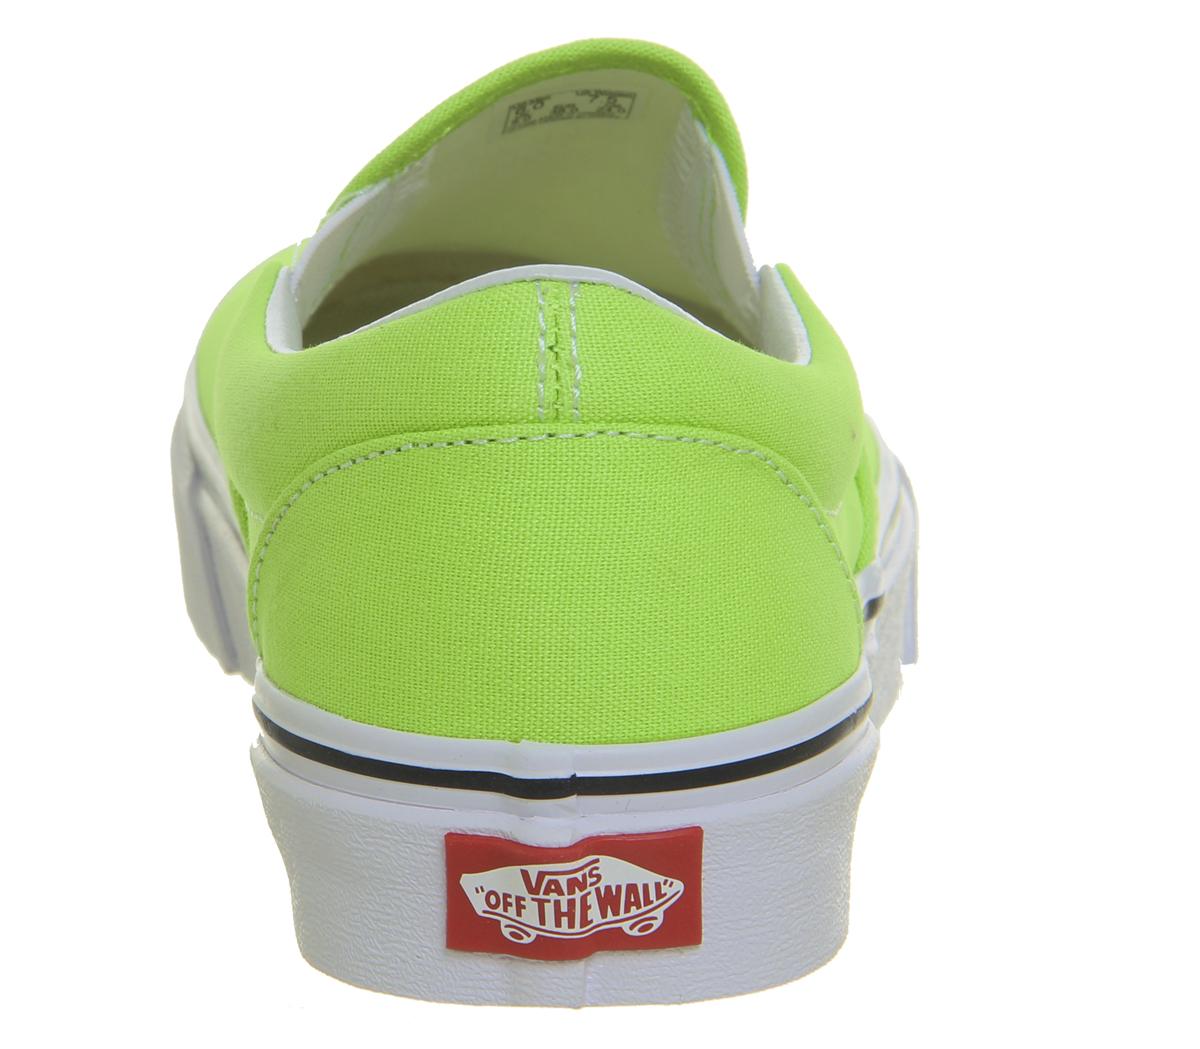 da95e8763606 Womens Vans Vans Classic Slip On Trainers Jasmine Green Trainers ...